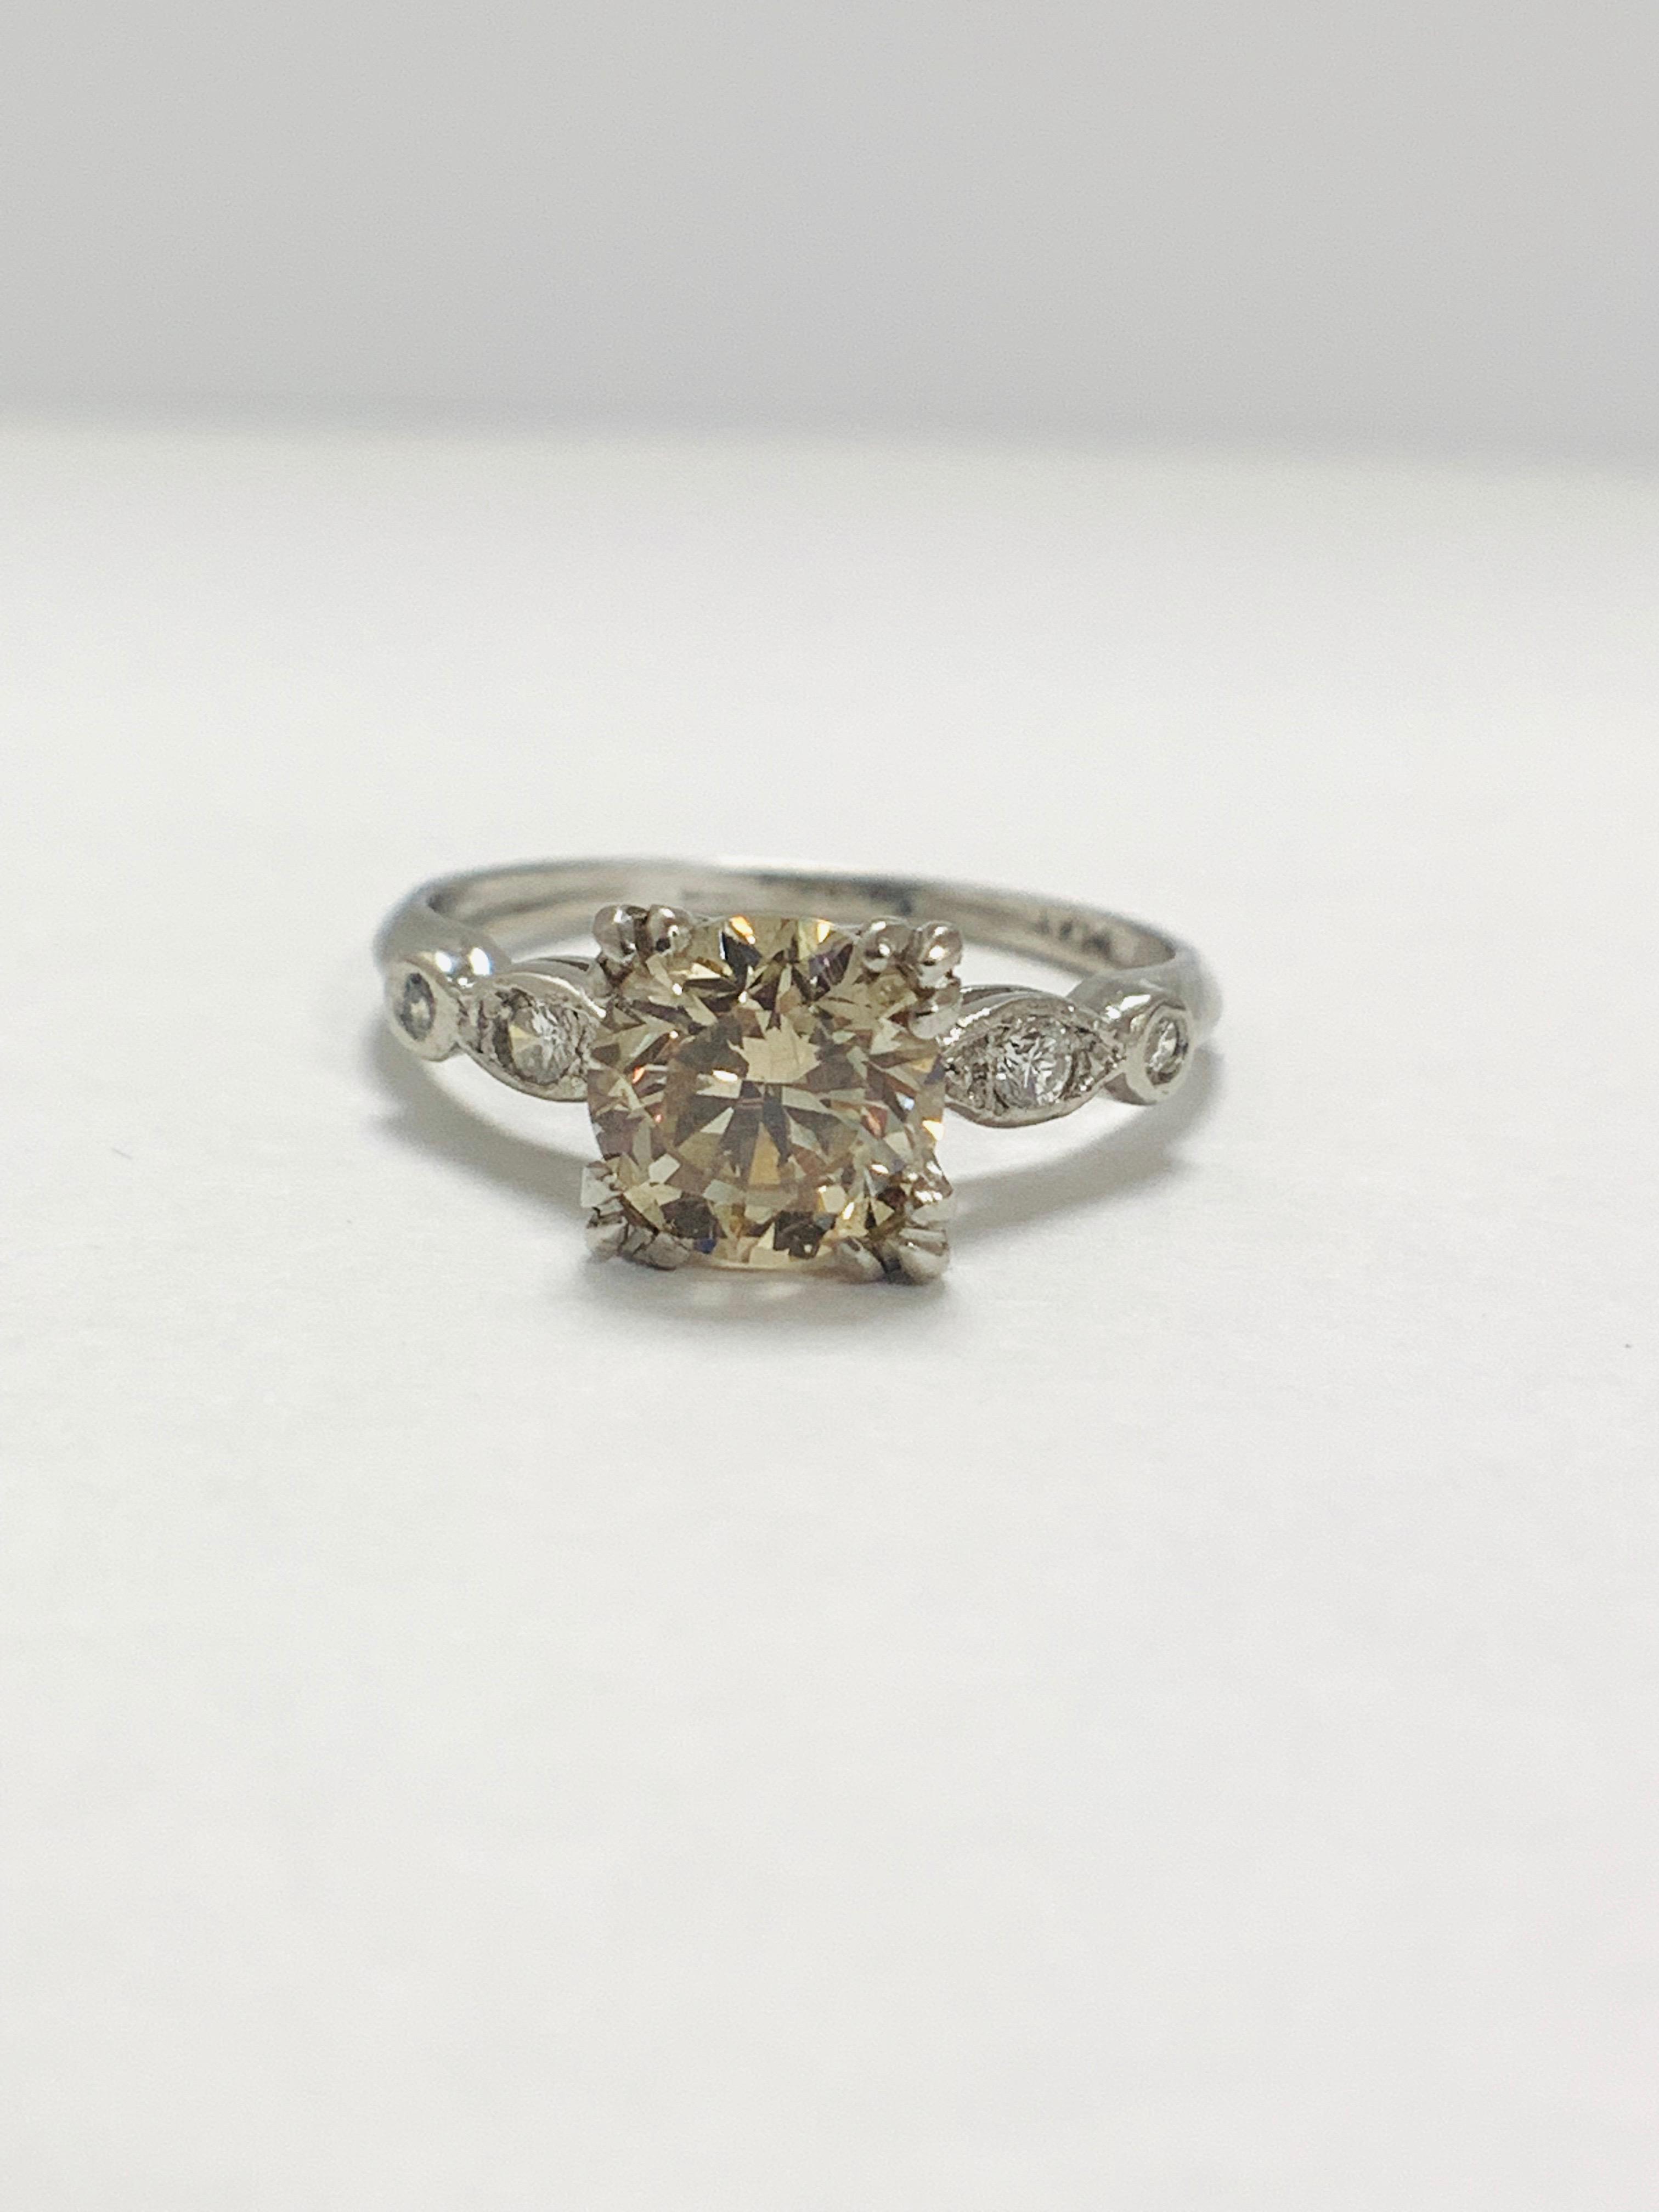 Platinum Diamond ring featuring centre, round brilliant cut, fancy light brown Diamond (1.55ct) - Image 9 of 14